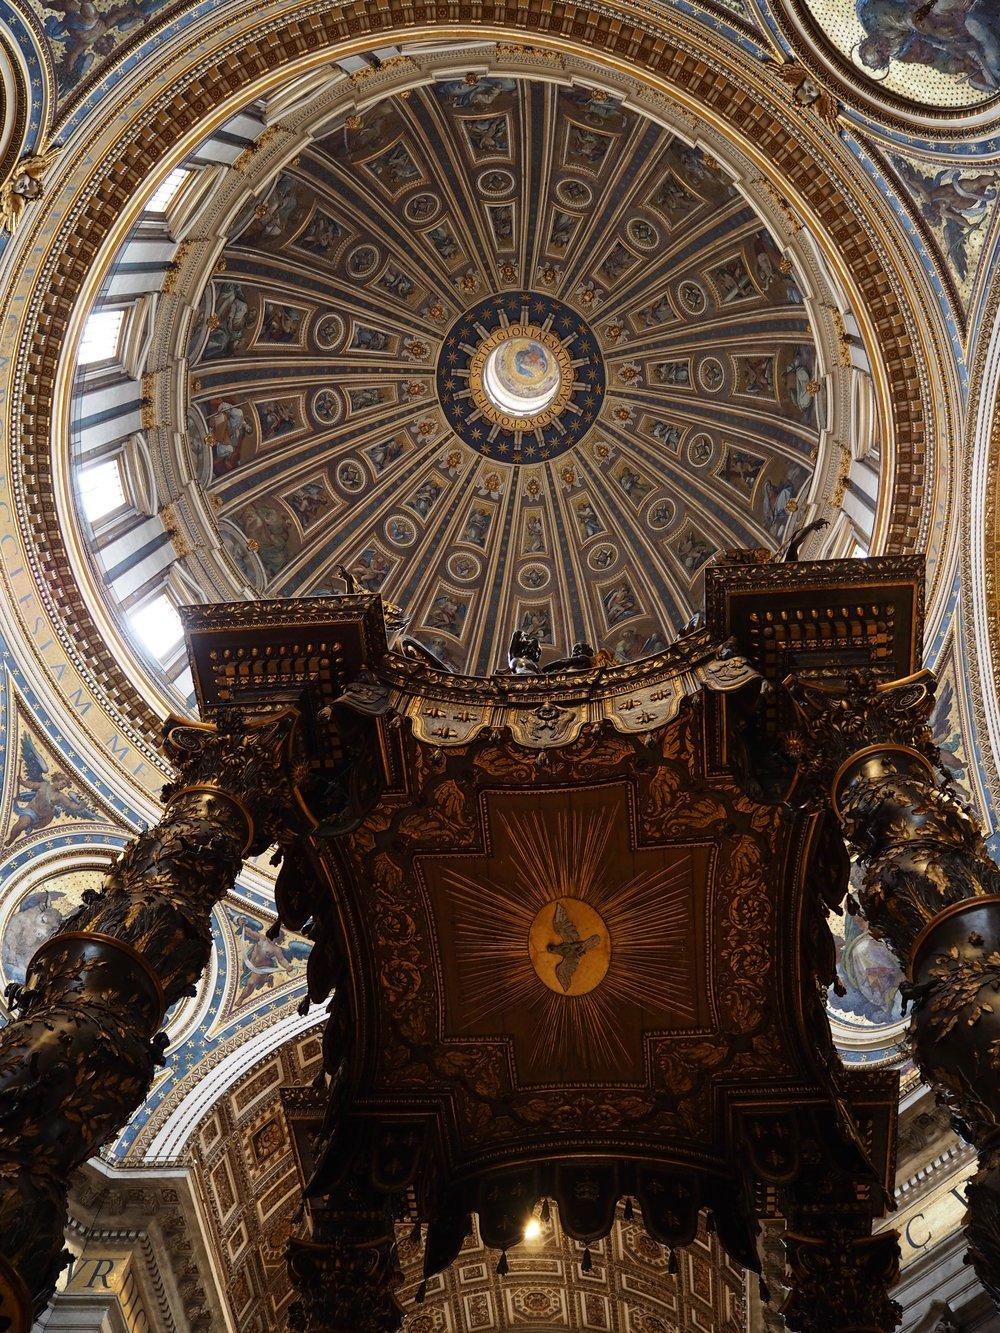 Vatican St. Peter's Basilica (c) when i've got time3 3.jpg